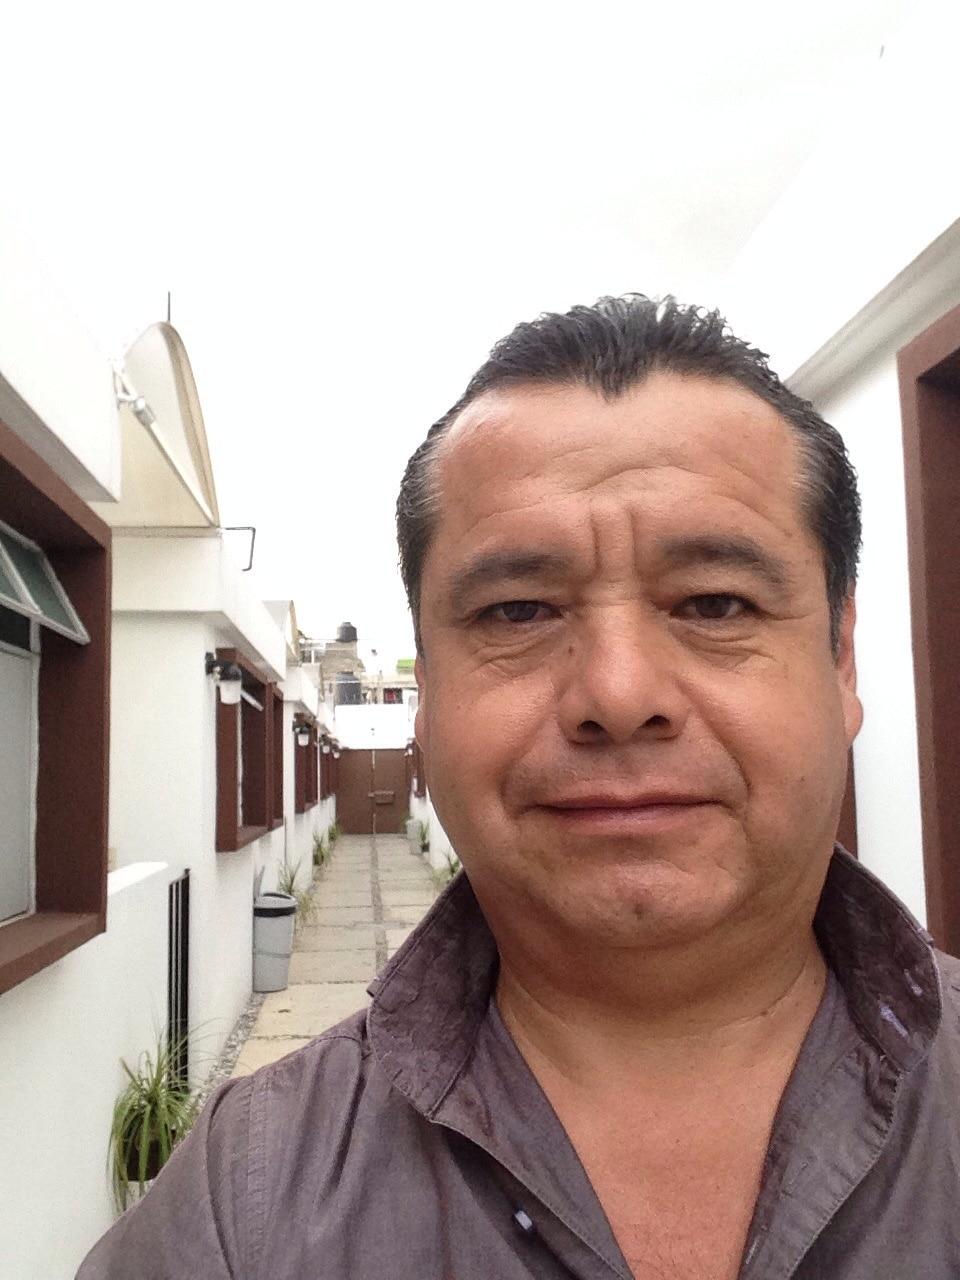 Luis from Puebla